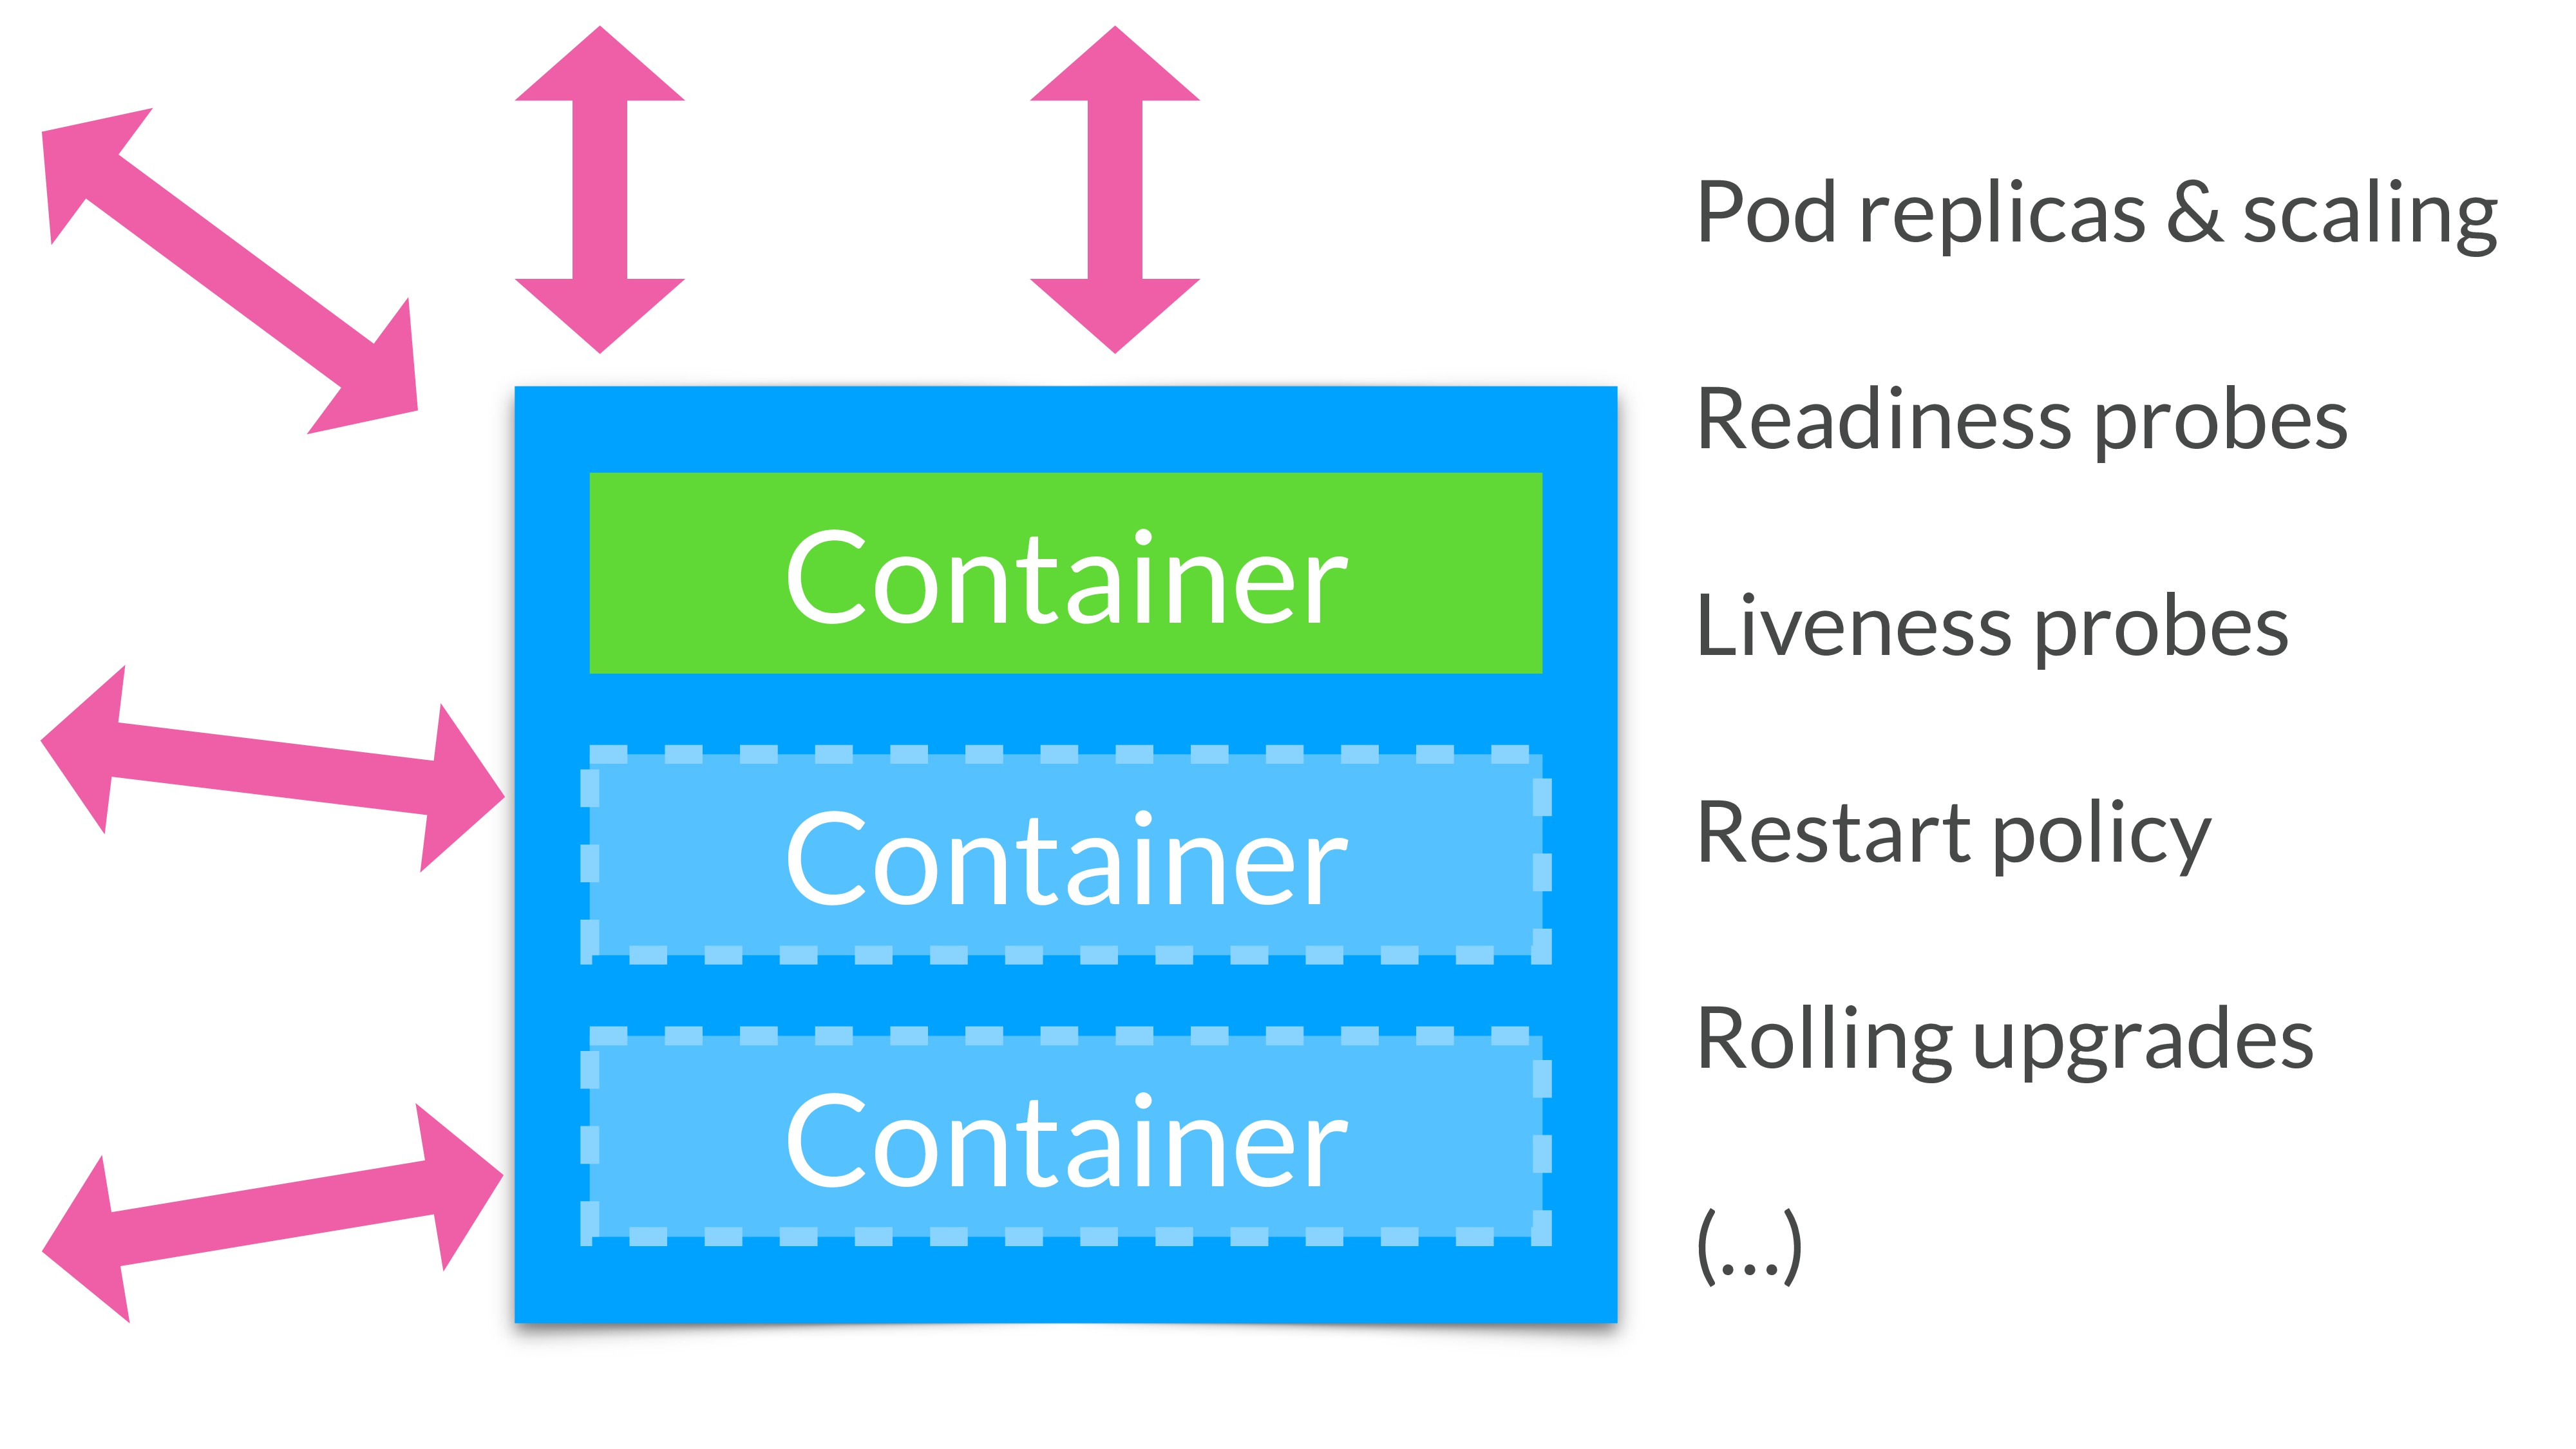 Container Container Container Pod replicas & sc...